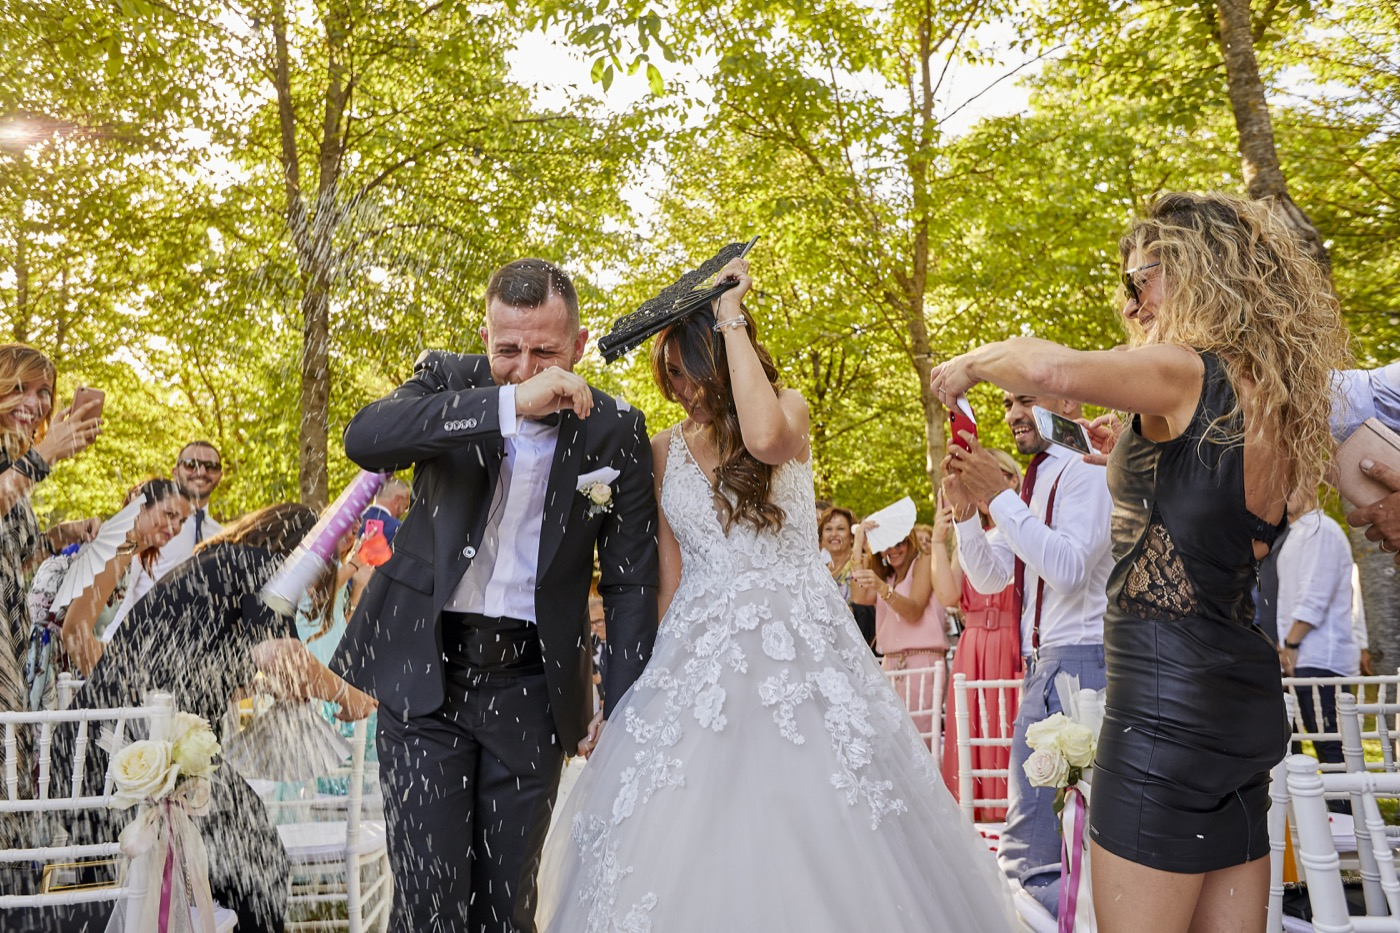 Claudio-Coppola-wedding-photographer-la-scuderia-eventi-preparativi-la-rosetta-perugia-64